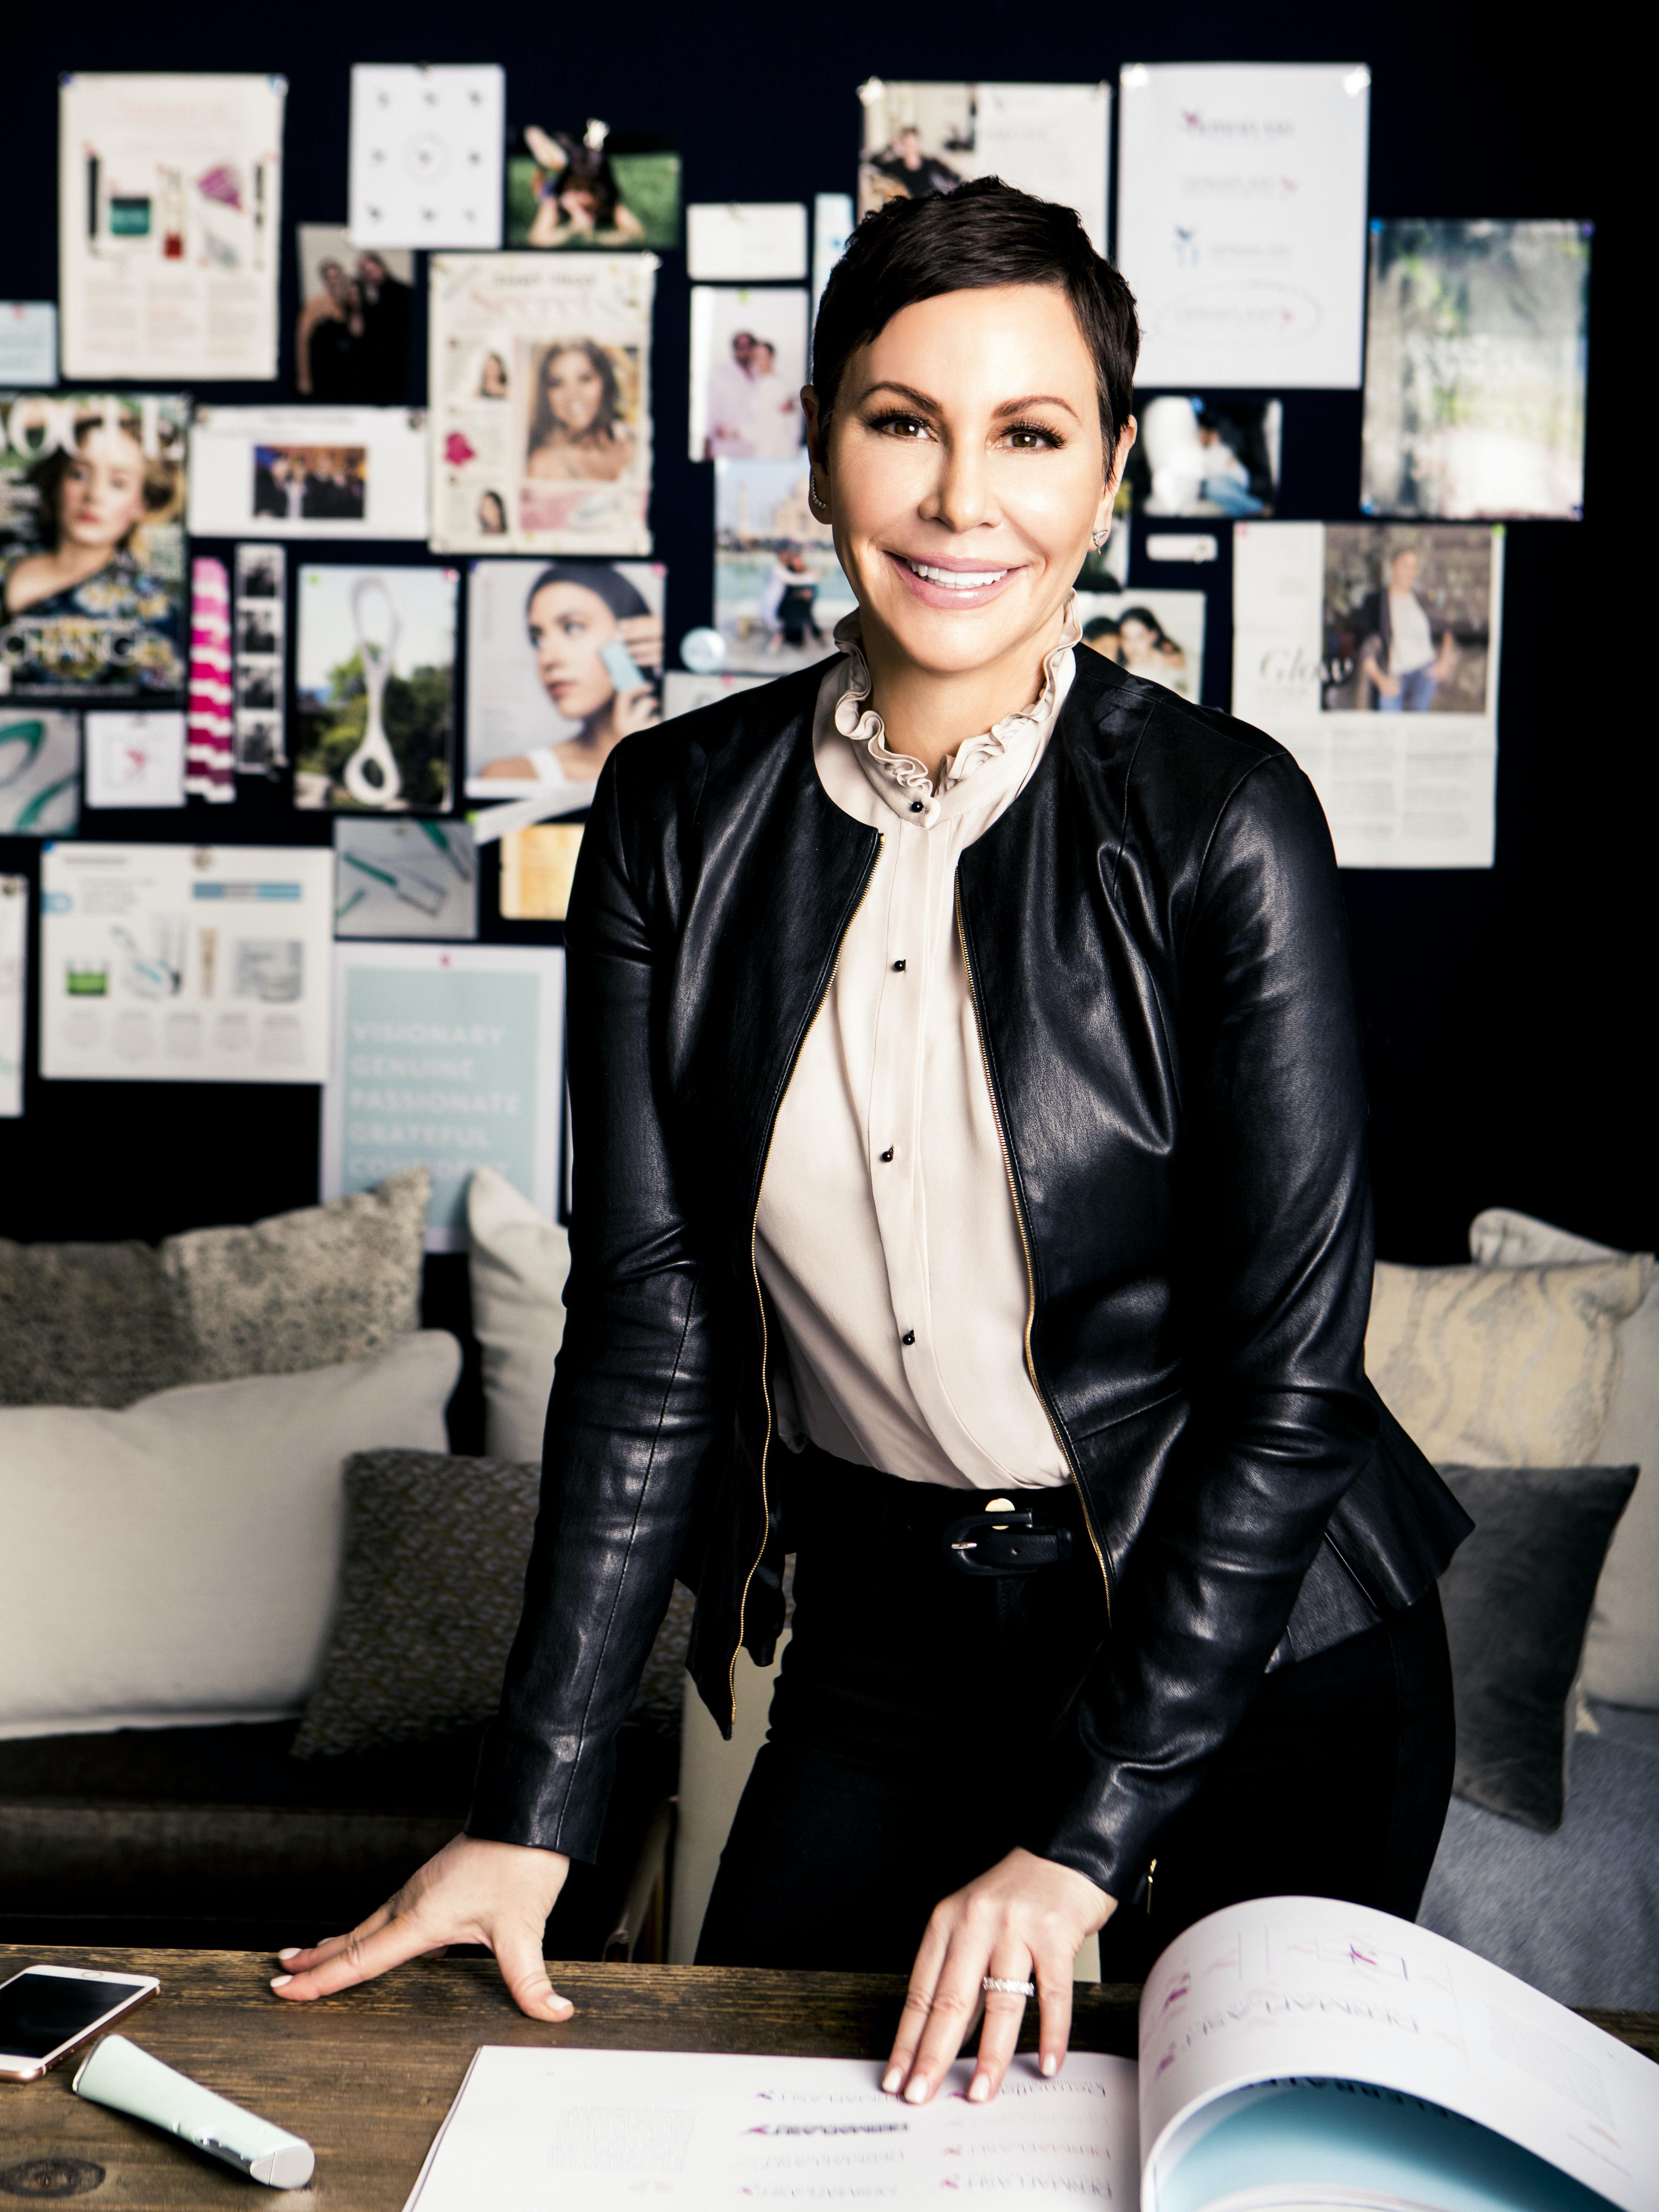 DERMAFLASH Founder Dara Levy in office